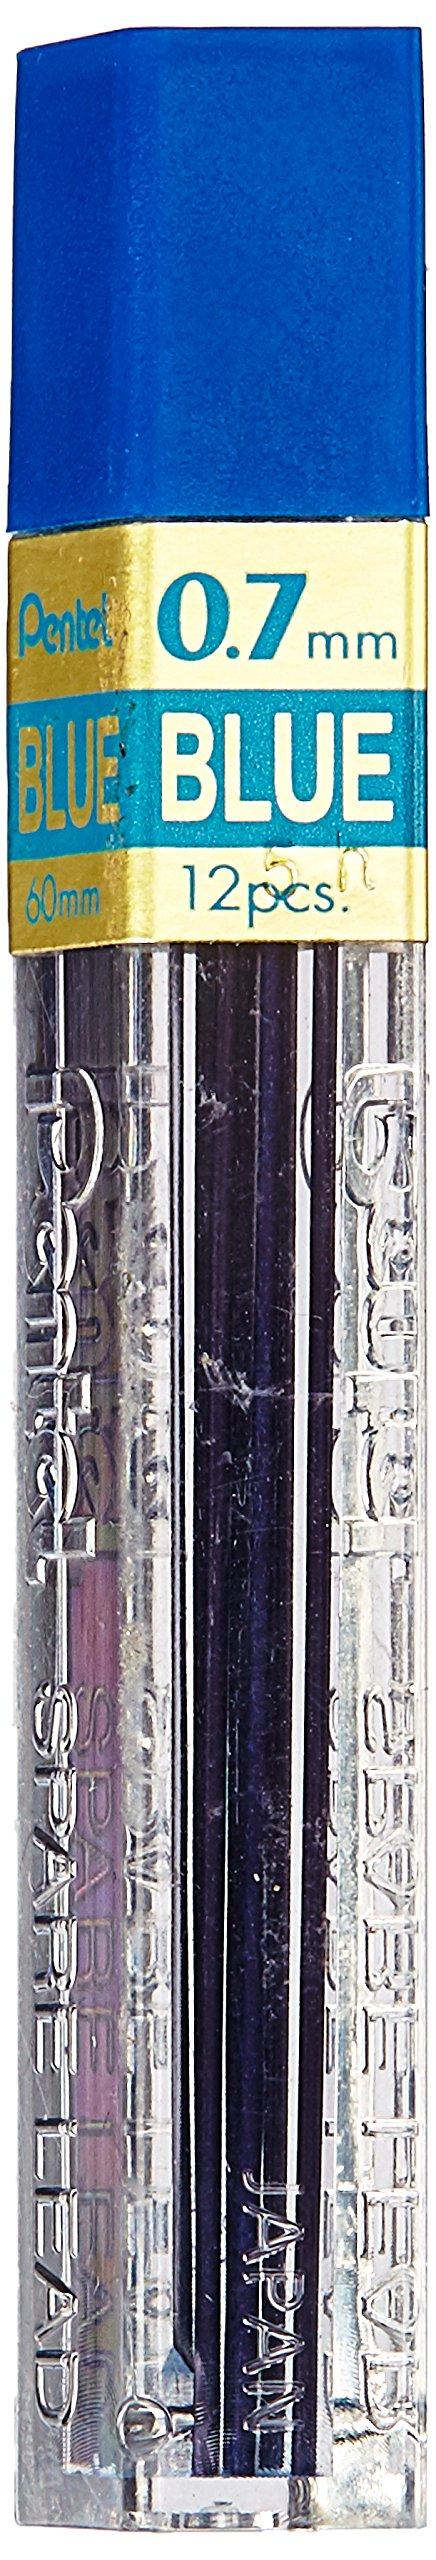 Pentel Lead Refill.7mm, 12/TB, Blue (PENPPB7)